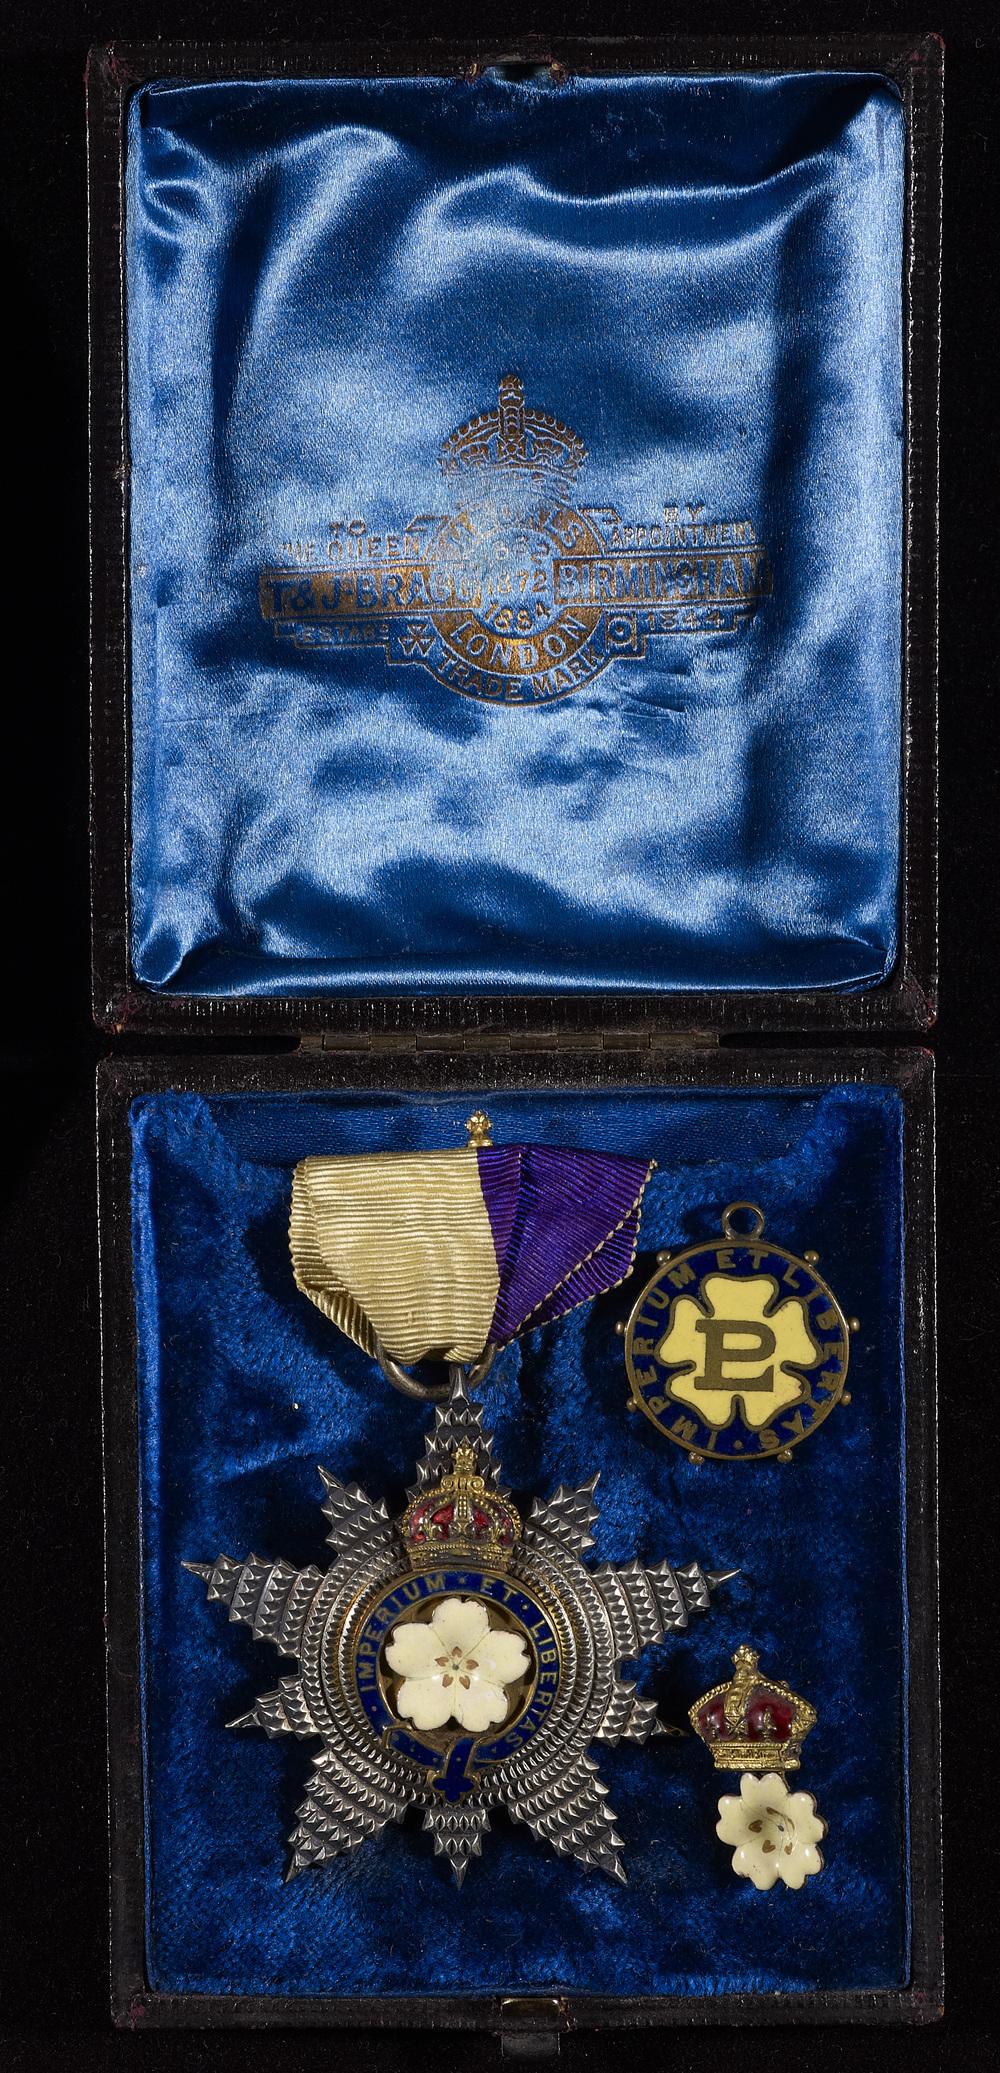 Primrose League star medal